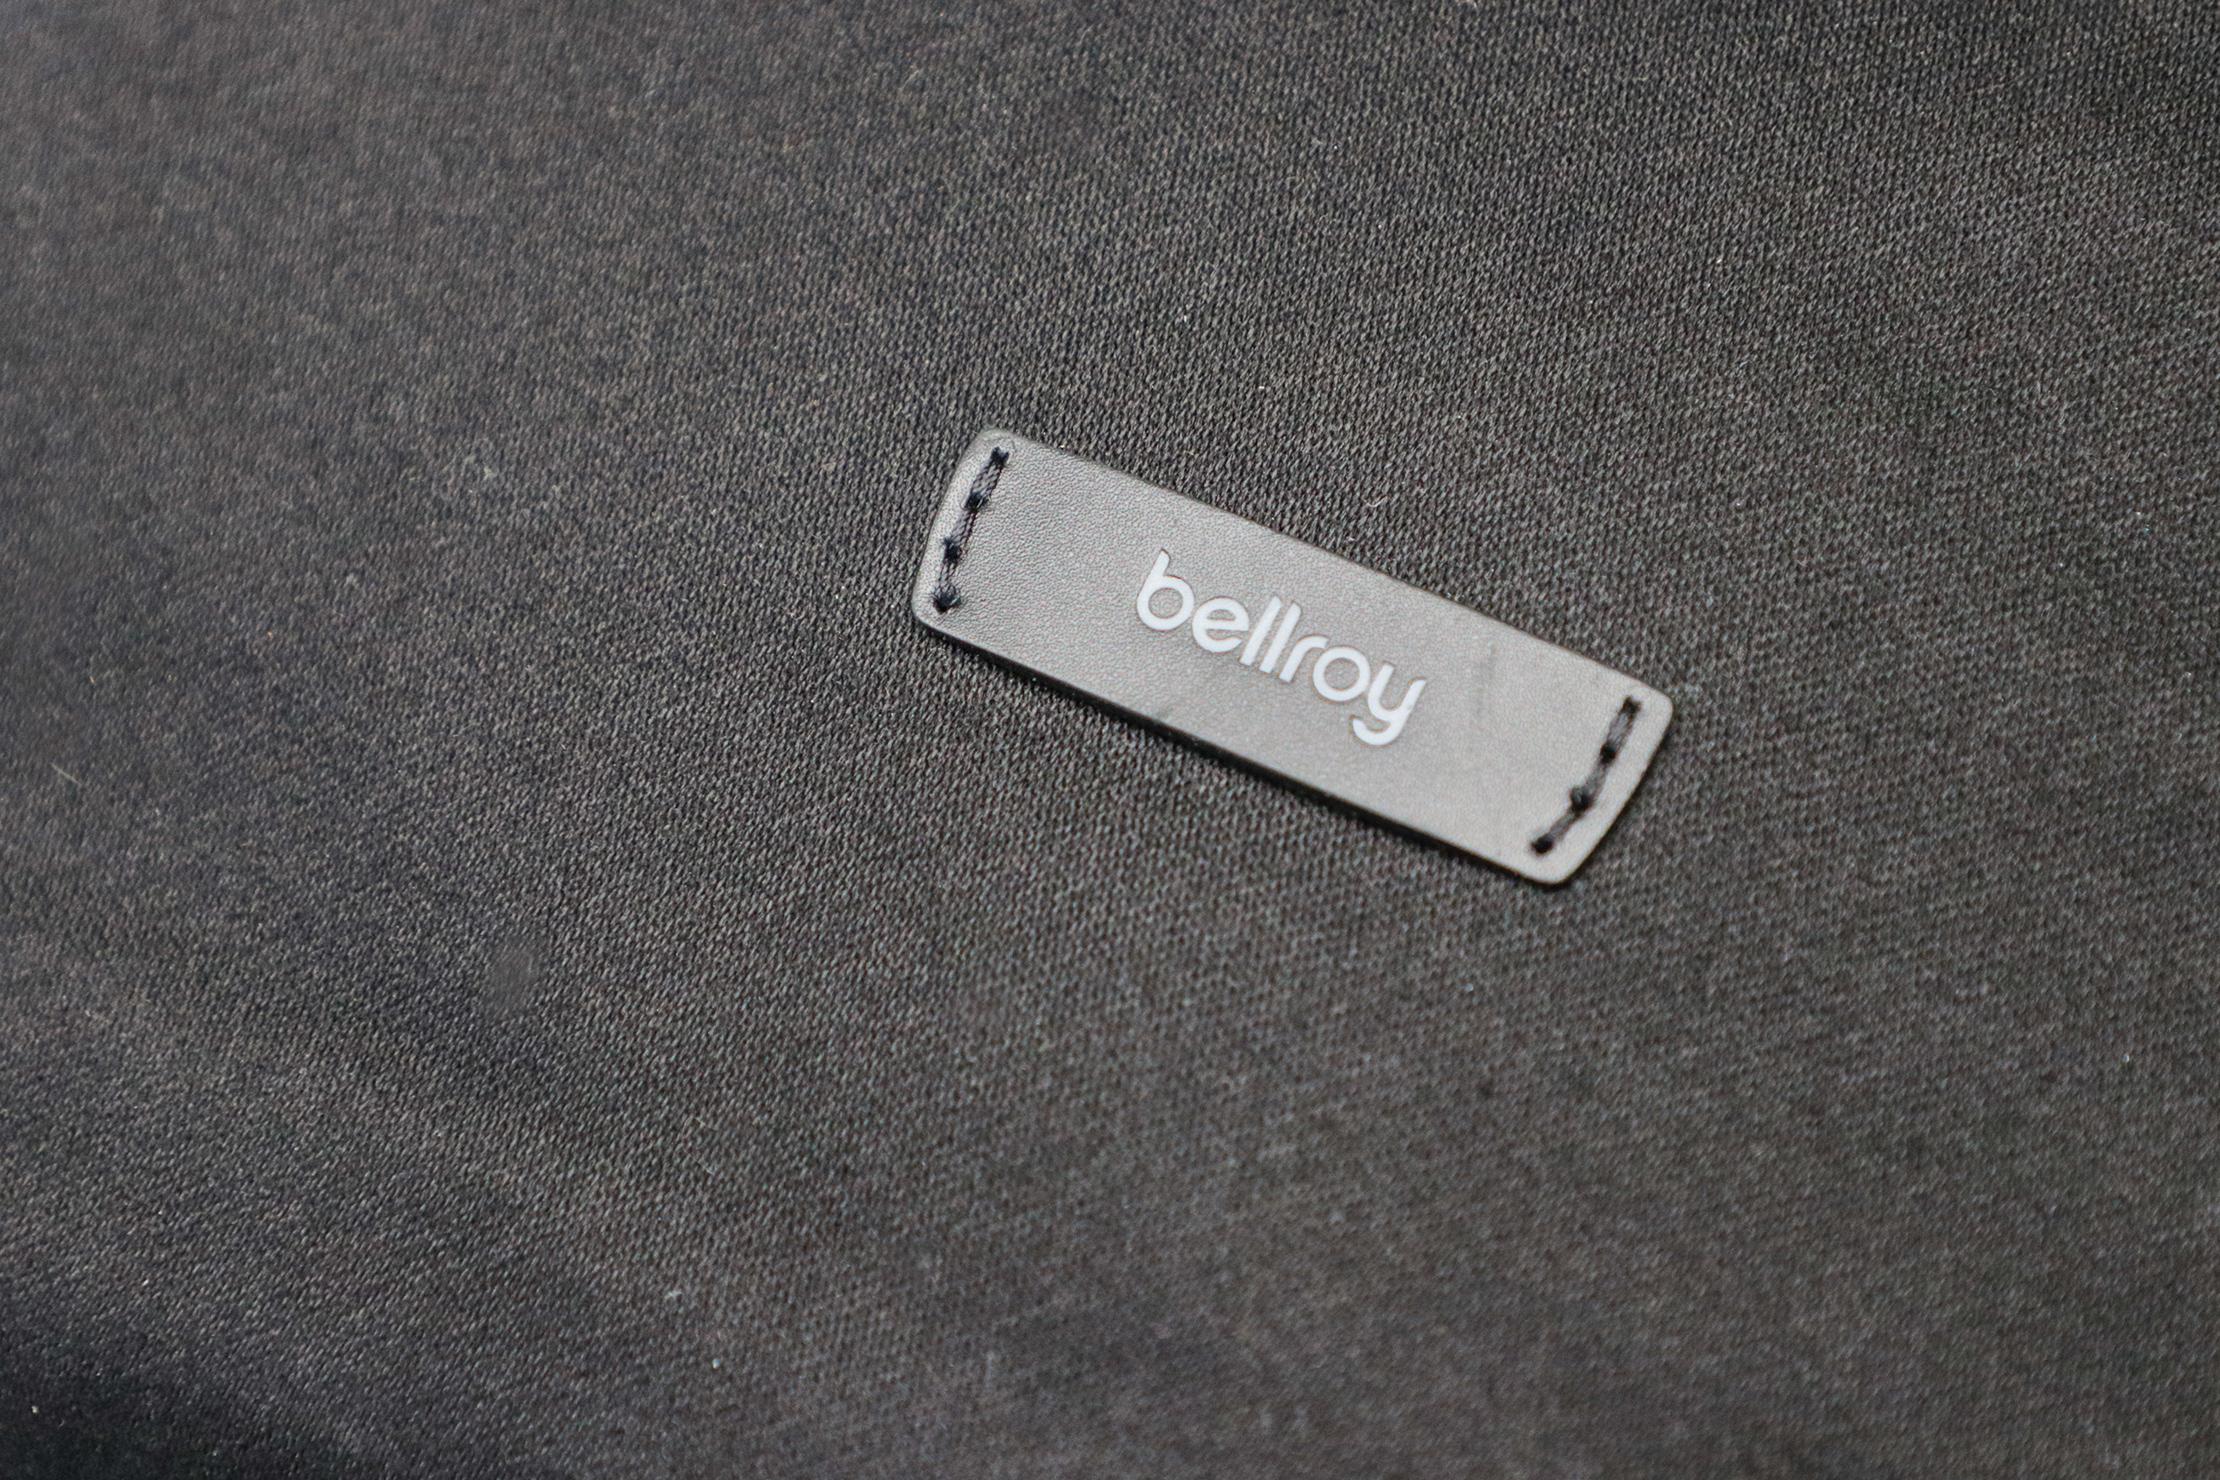 Bellroy Melbourne Backpack Material